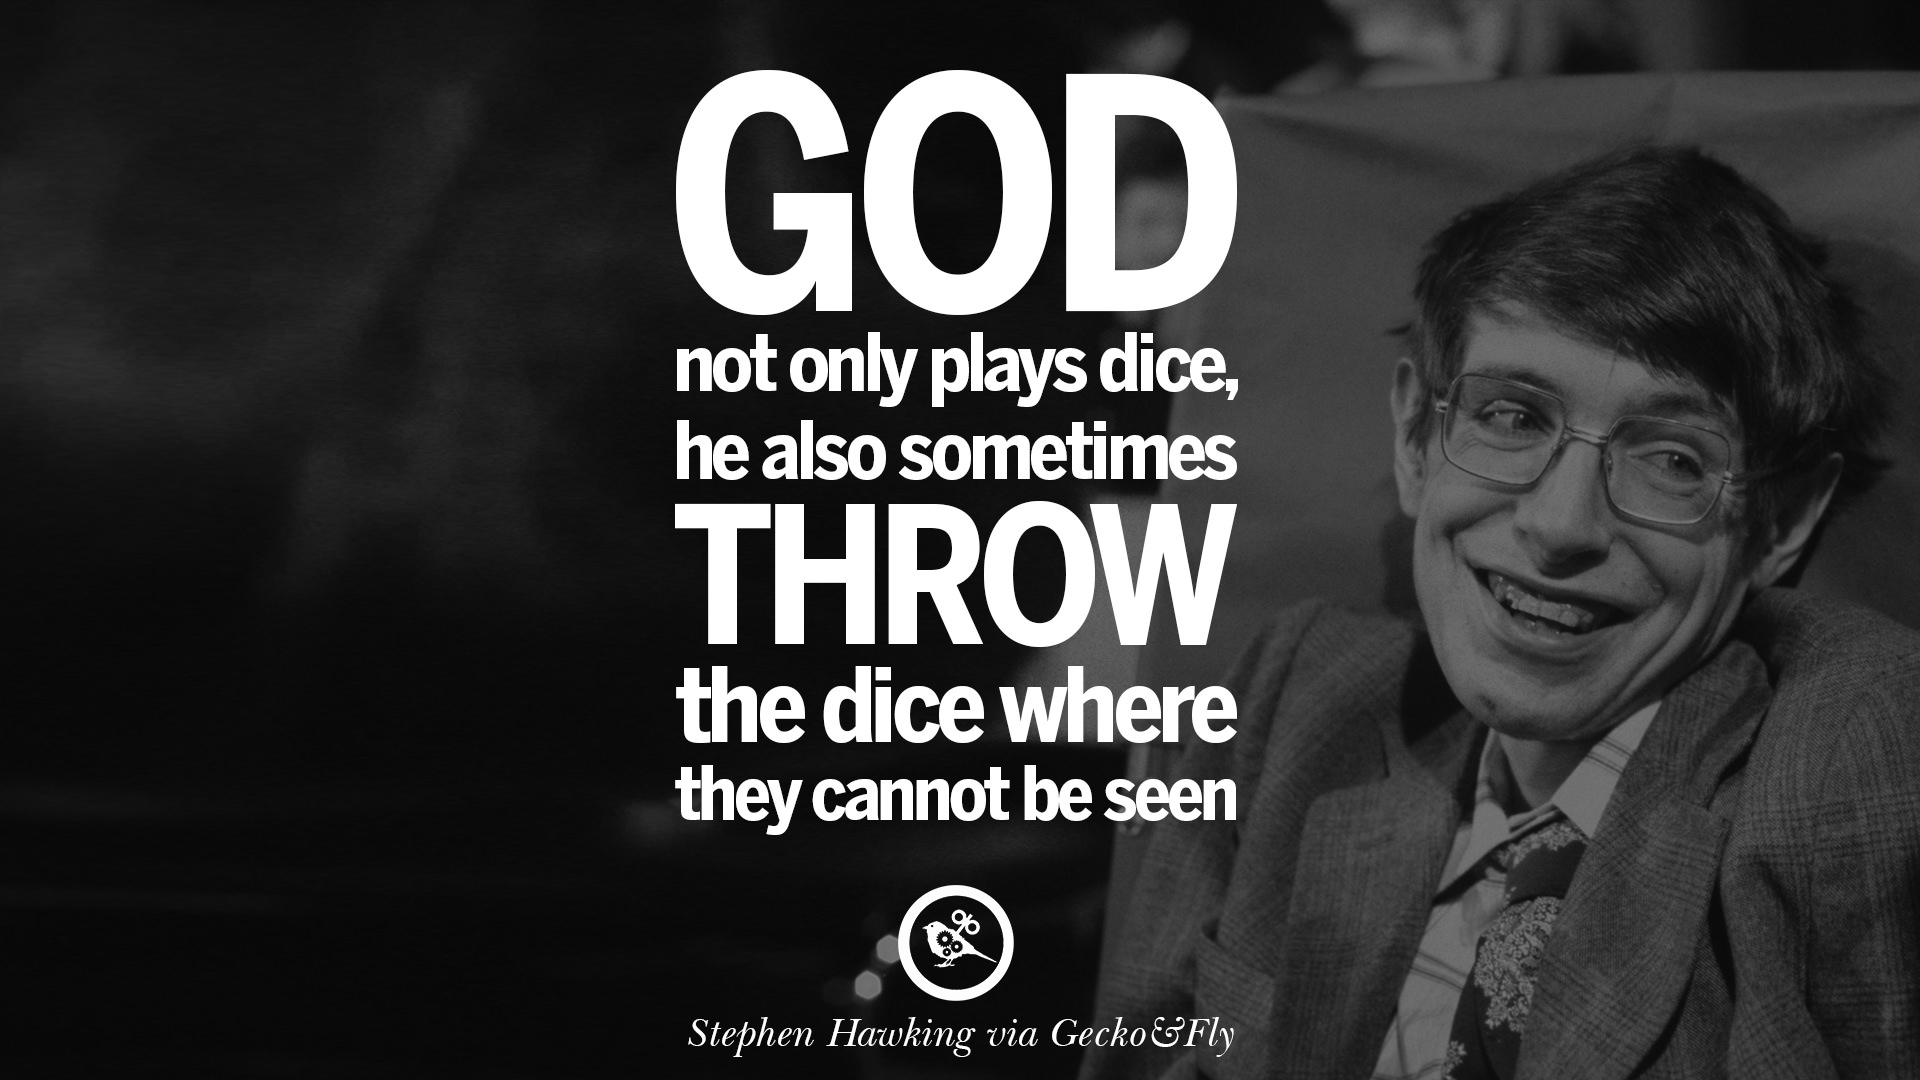 Stephen Hawking Quotes On God